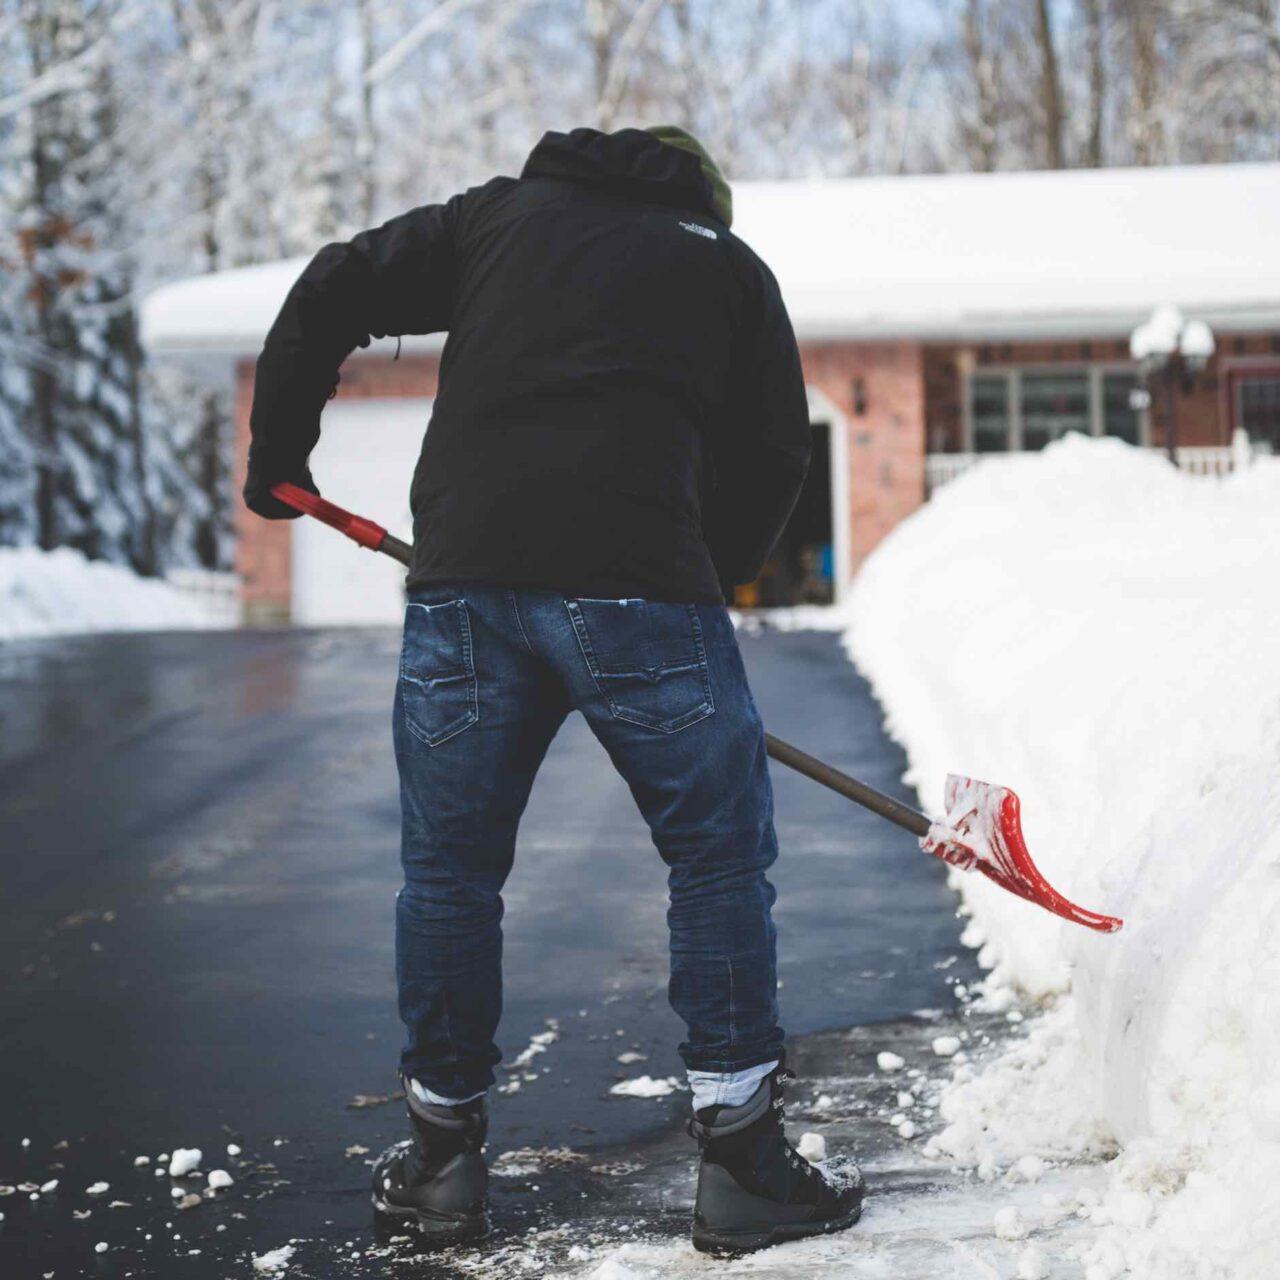 https://mk0mosaichomesep04mv.kinstacdn.com/wp-content/uploads/2021/06/snow-shoveling-small-1280x1280.jpg